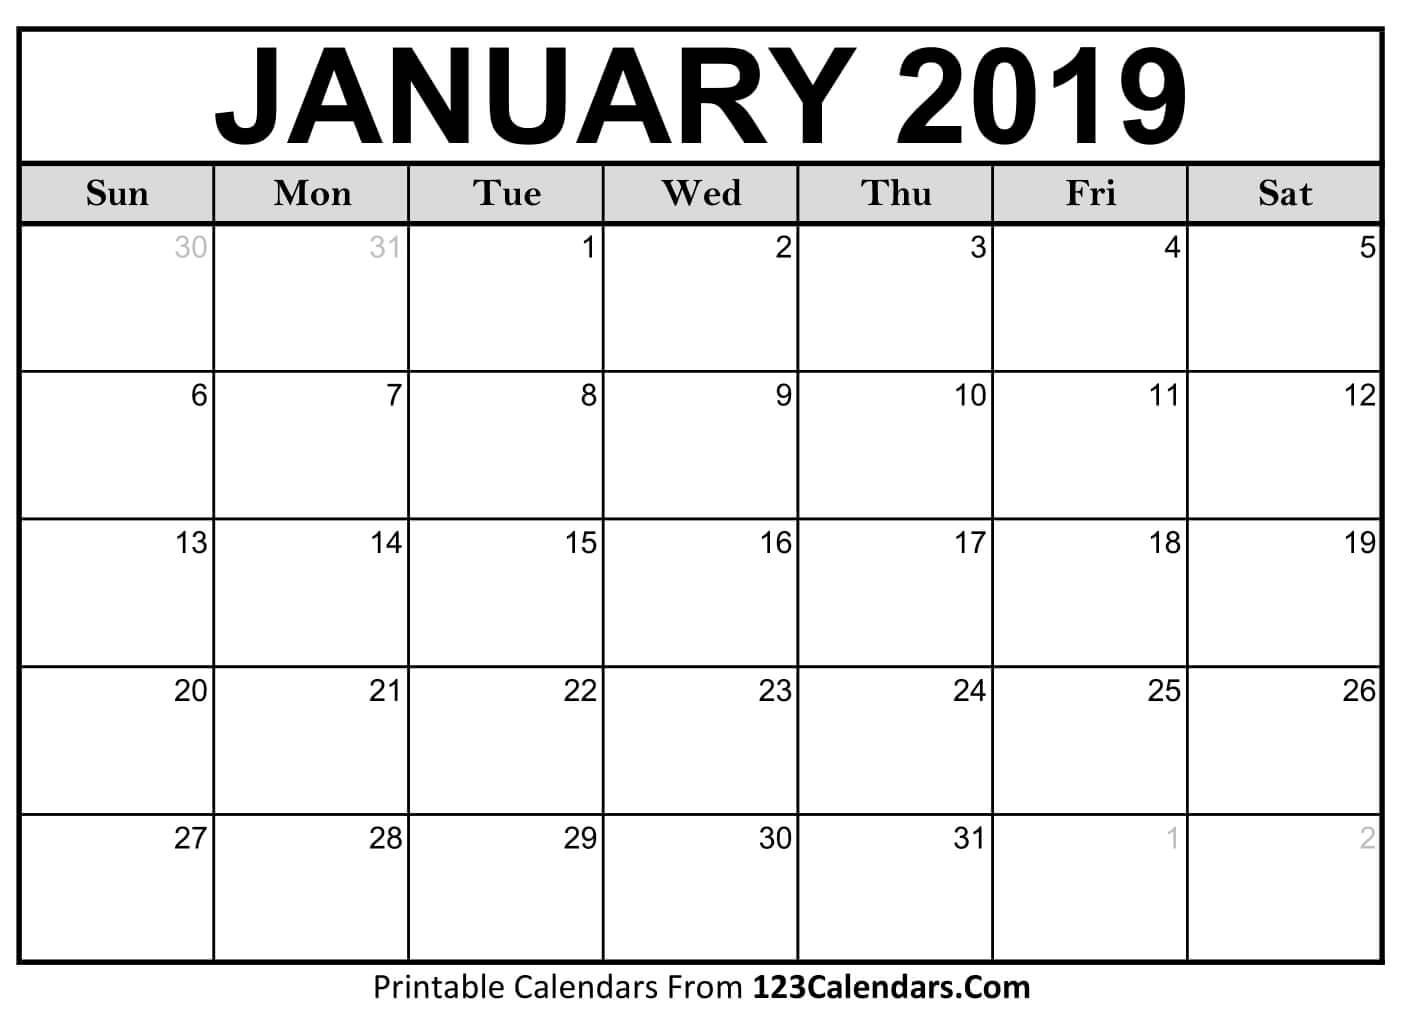 january 2019 activity calendar  u2013 babcock community care centre